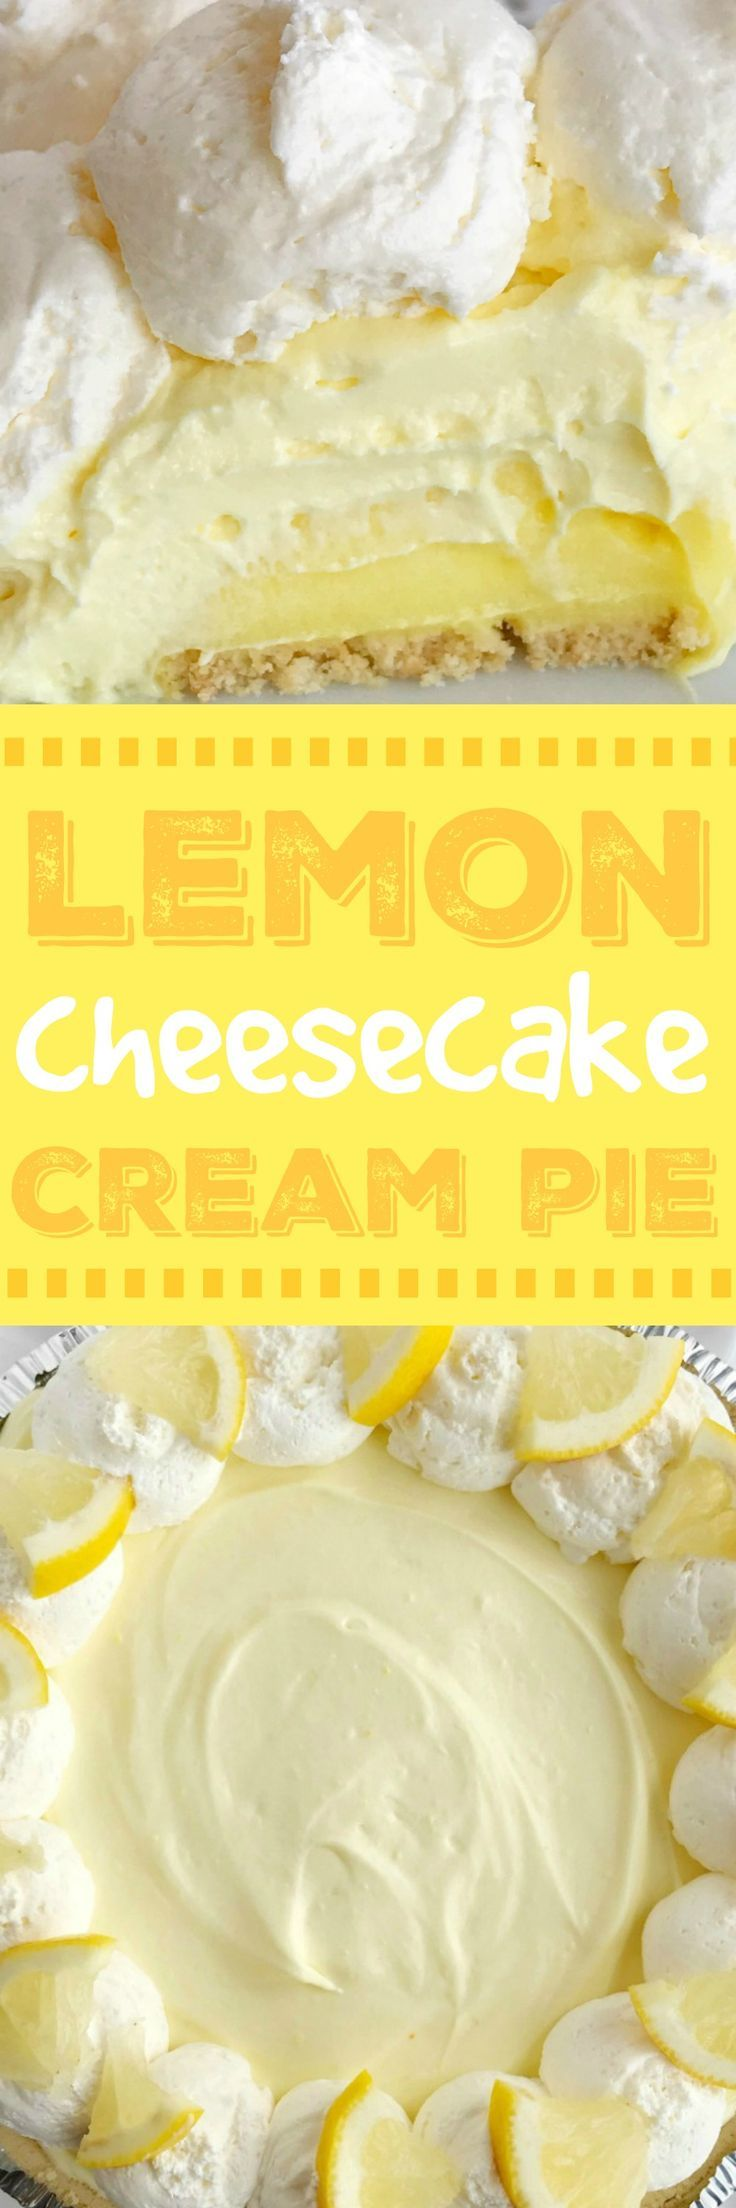 No Bake Lemon Cheesecake Cream Pie | Lemon Desserts | No Bake Pie Recipe | No Bake Desserts | Lemon | Citrus Recipe #nobakerecipes #dessertrecipes #pie #creampie